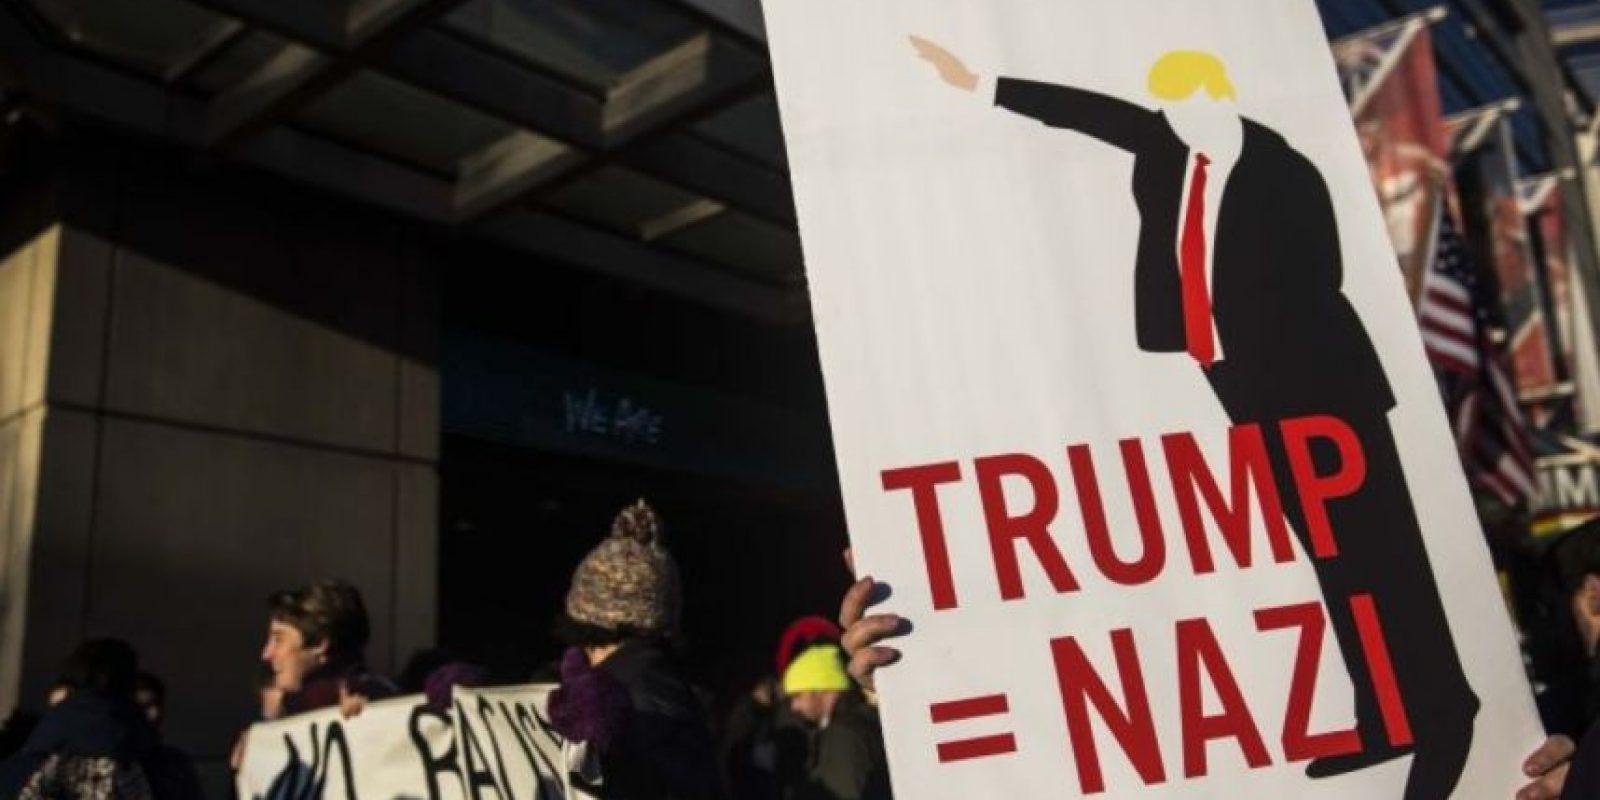 O en lugares donde da discursos de campaña. Foto:Getty Images